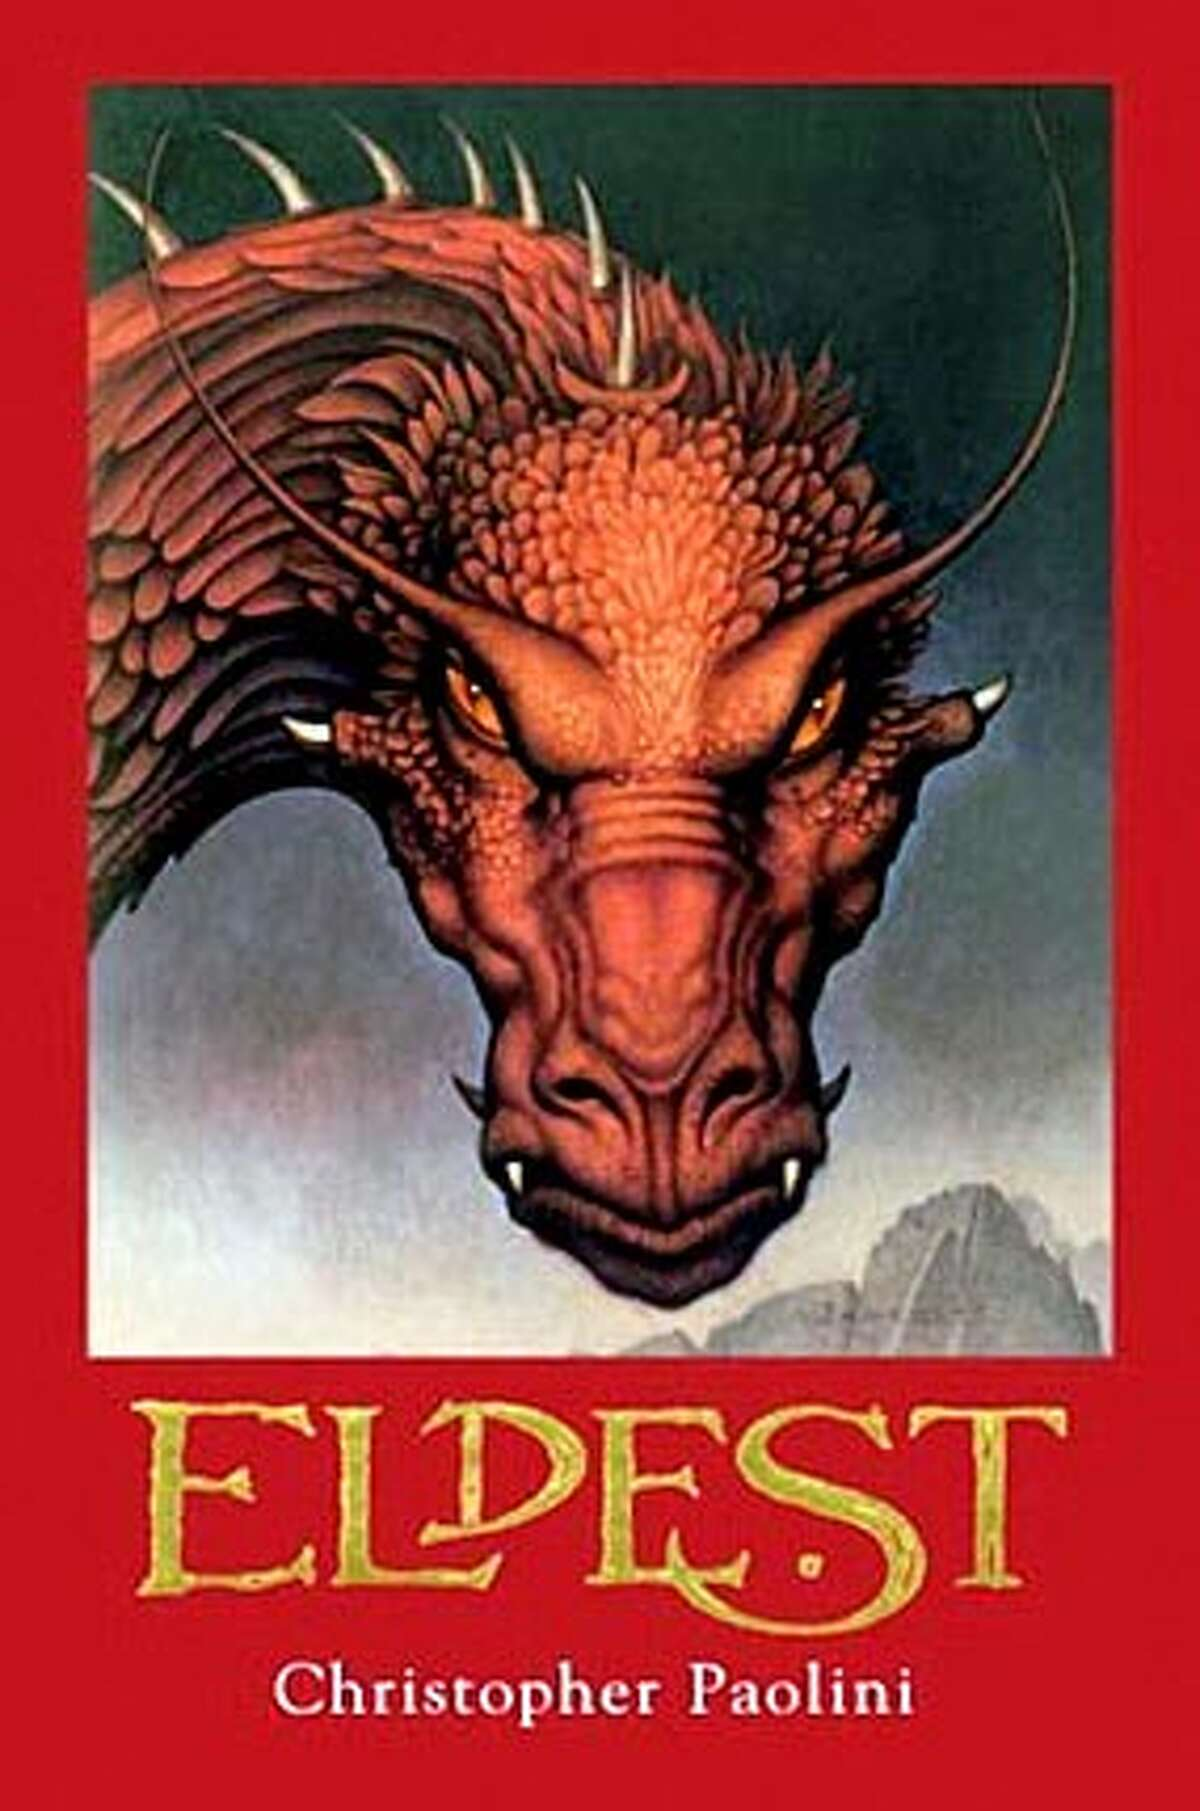 Eldest (Inheritance, Book 2) on 10/5/05 in . / HO